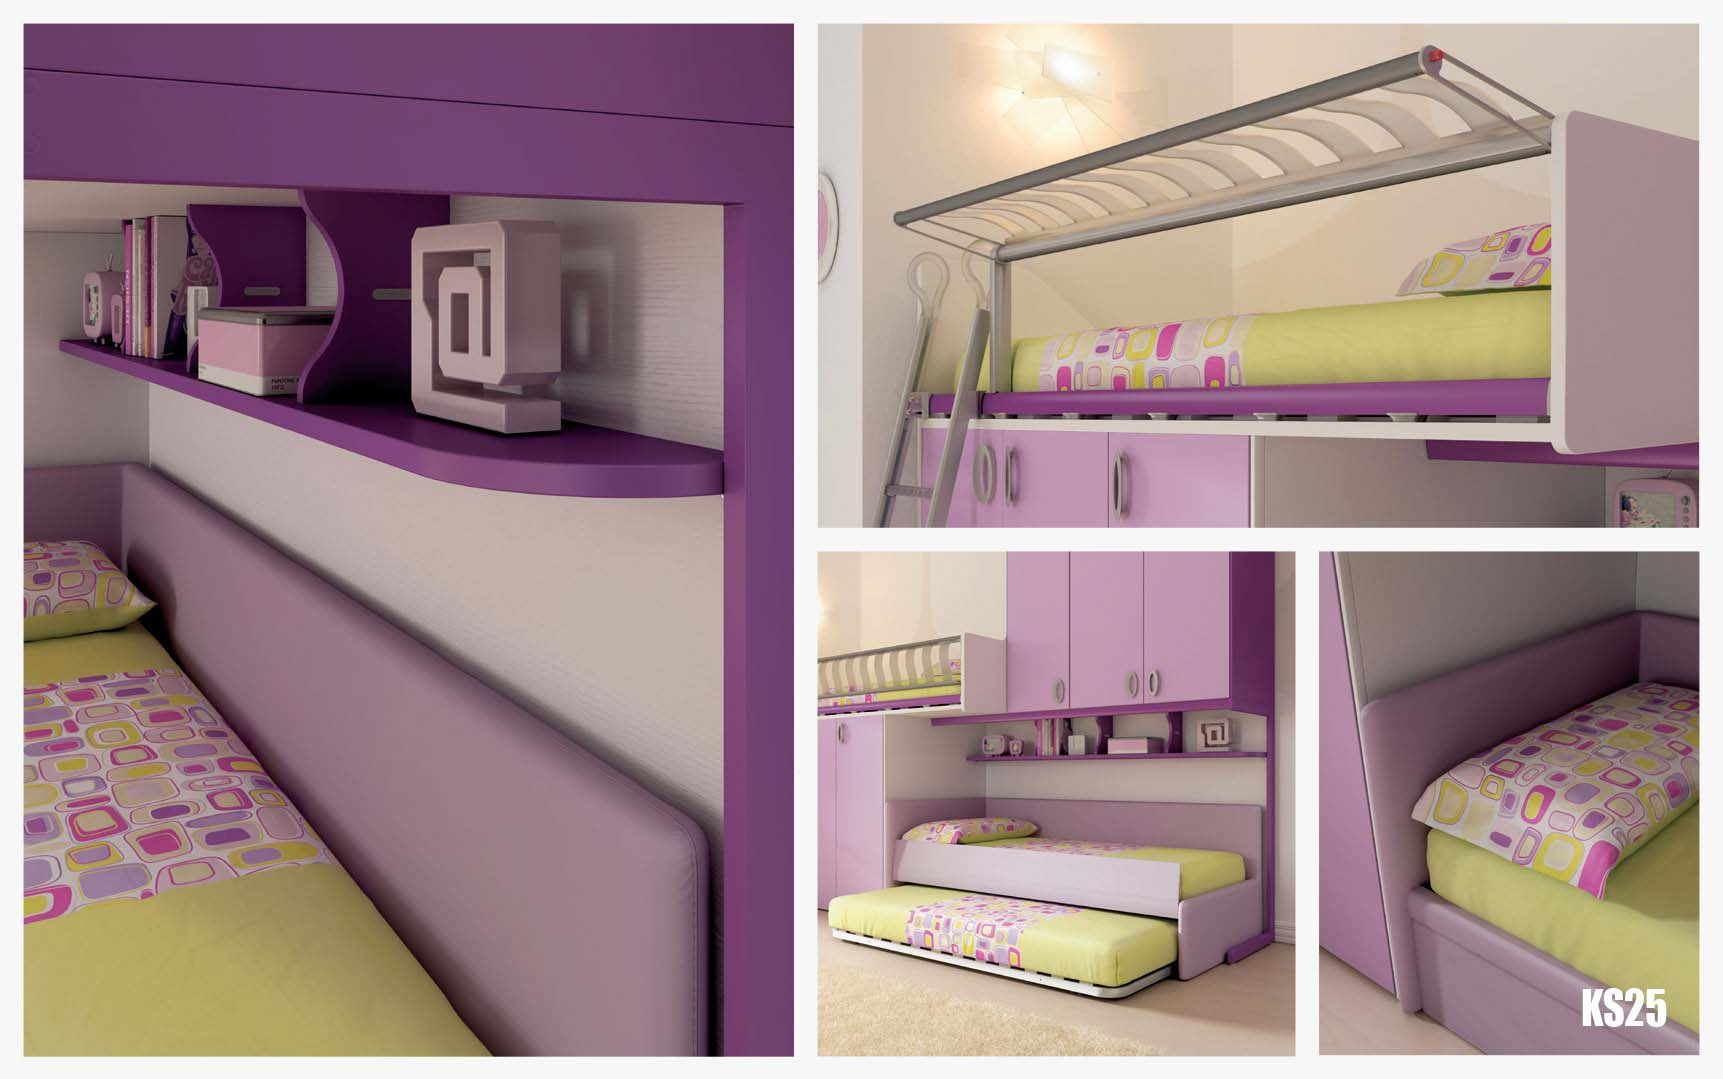 chambre enfant lits superpos s gigogne moretti compact so nuit. Black Bedroom Furniture Sets. Home Design Ideas